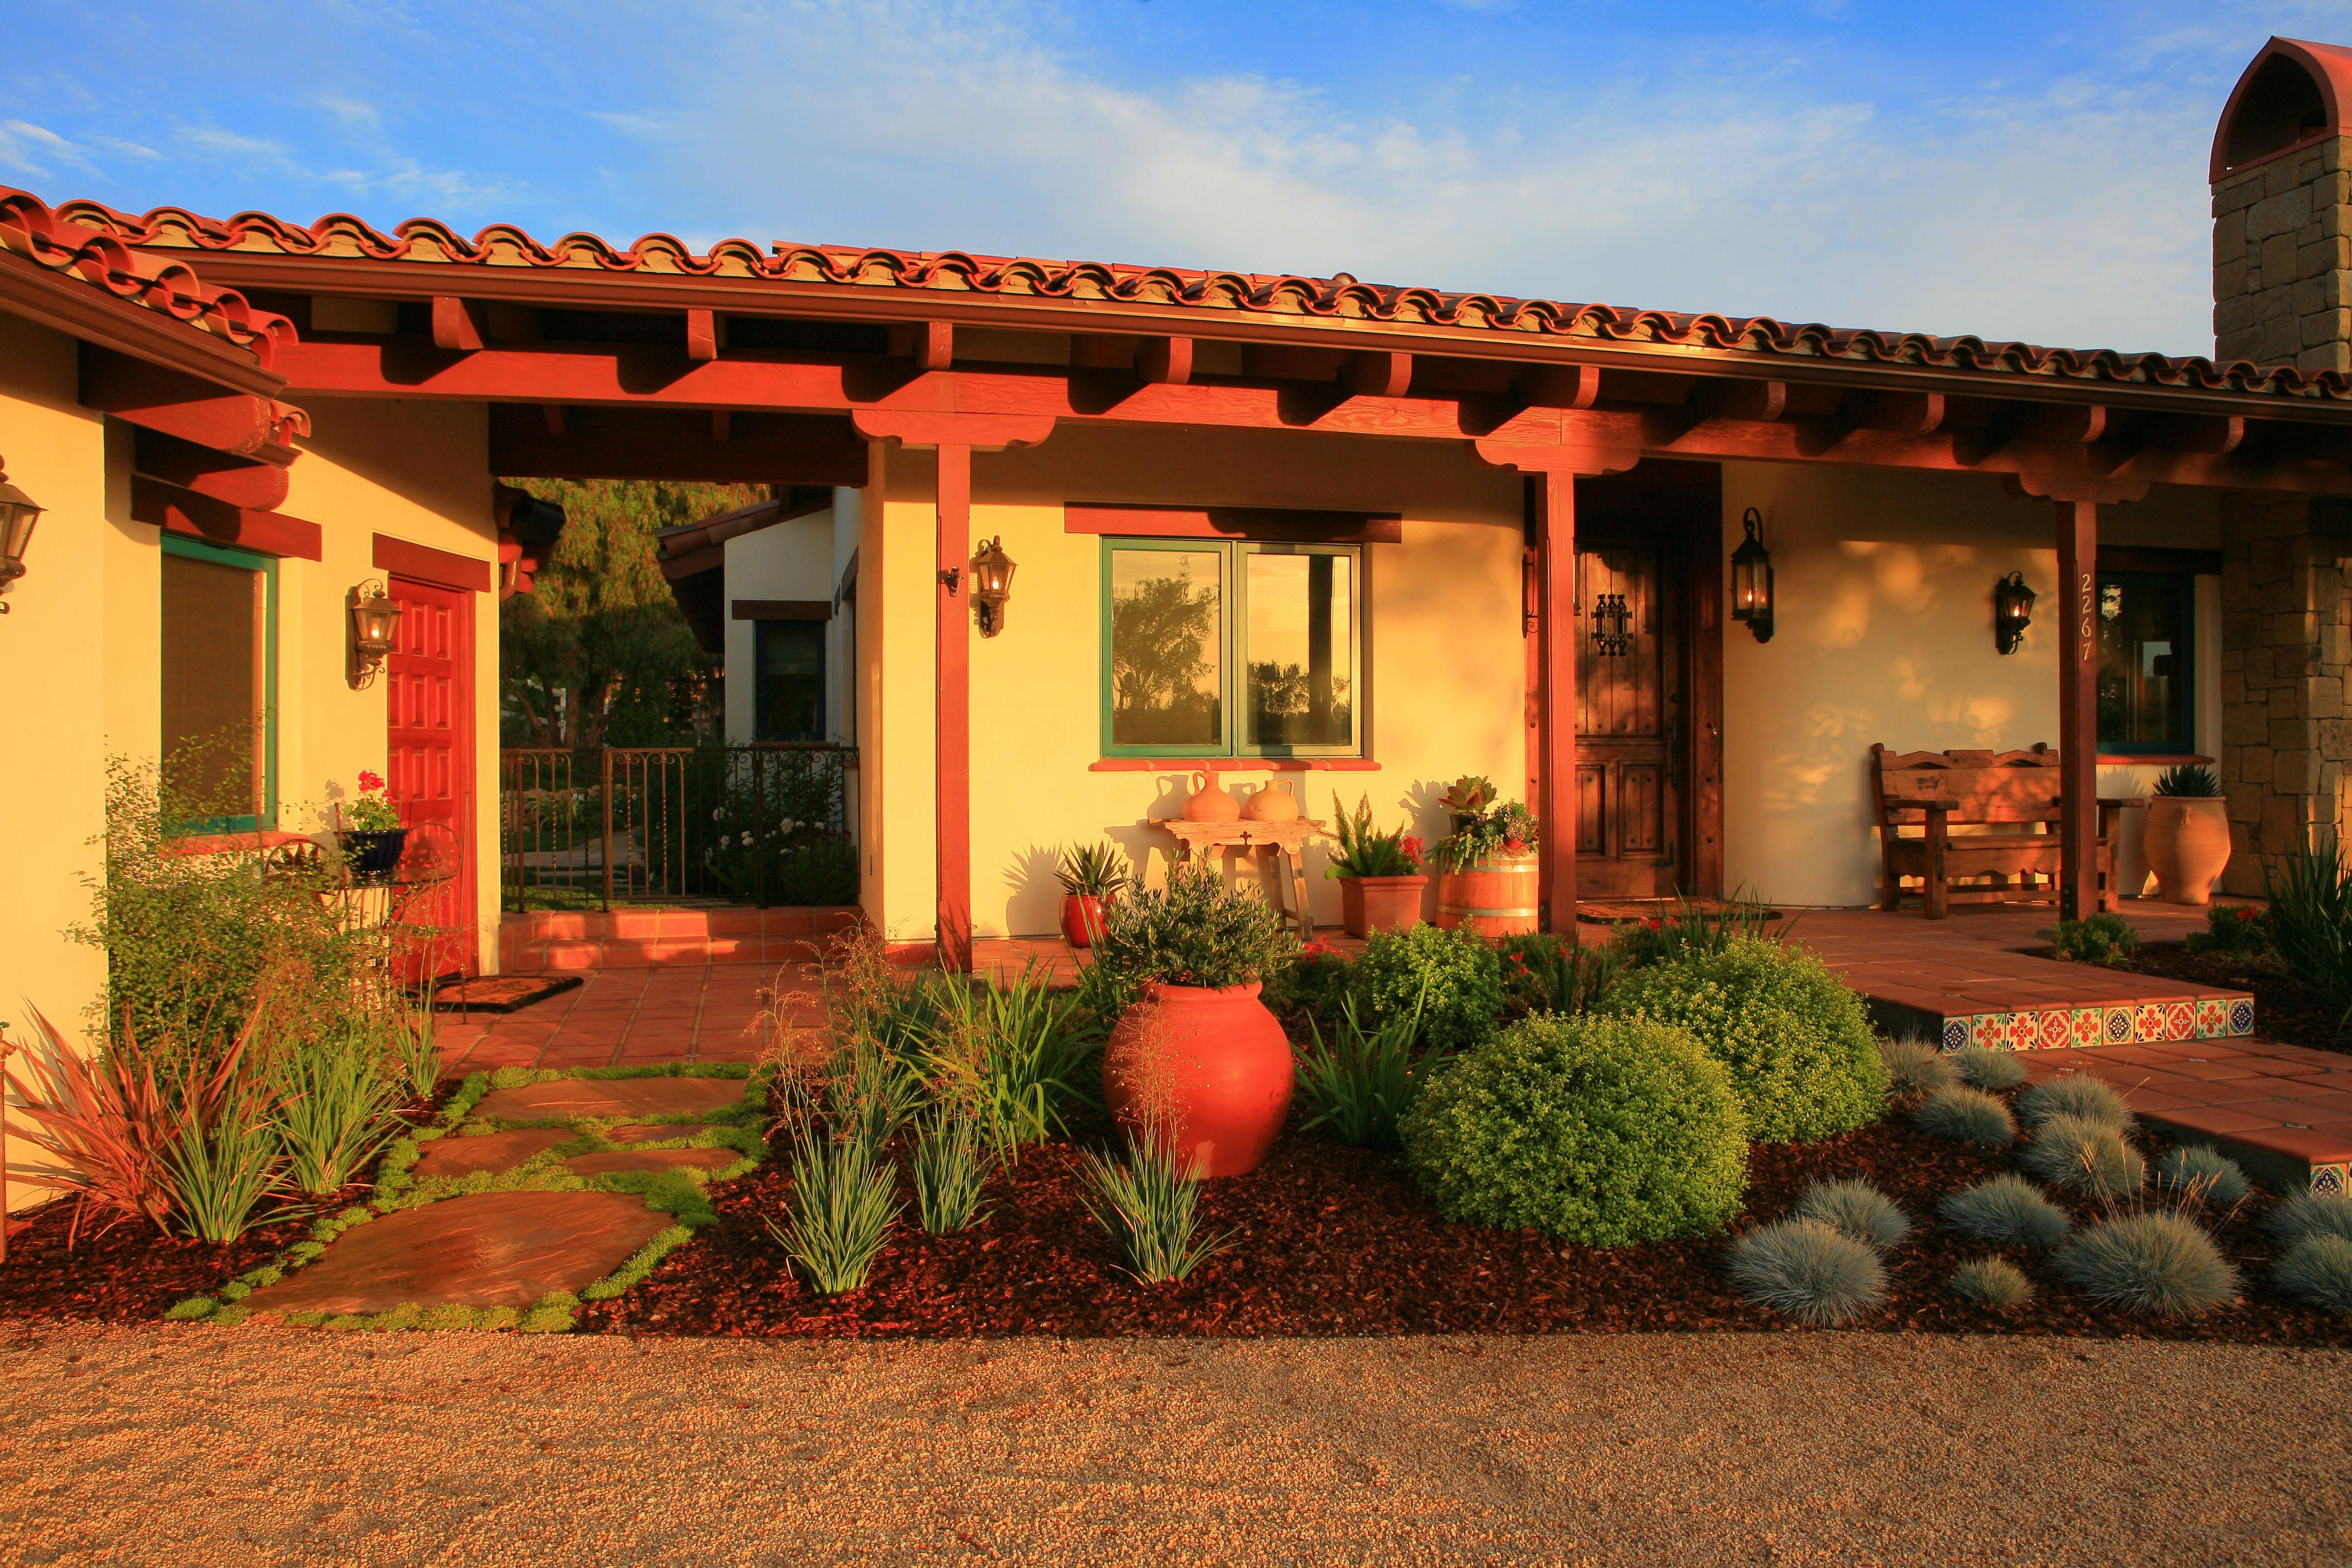 Hacienda Style Homes Wonderful 18 Eye Of The Day Garden